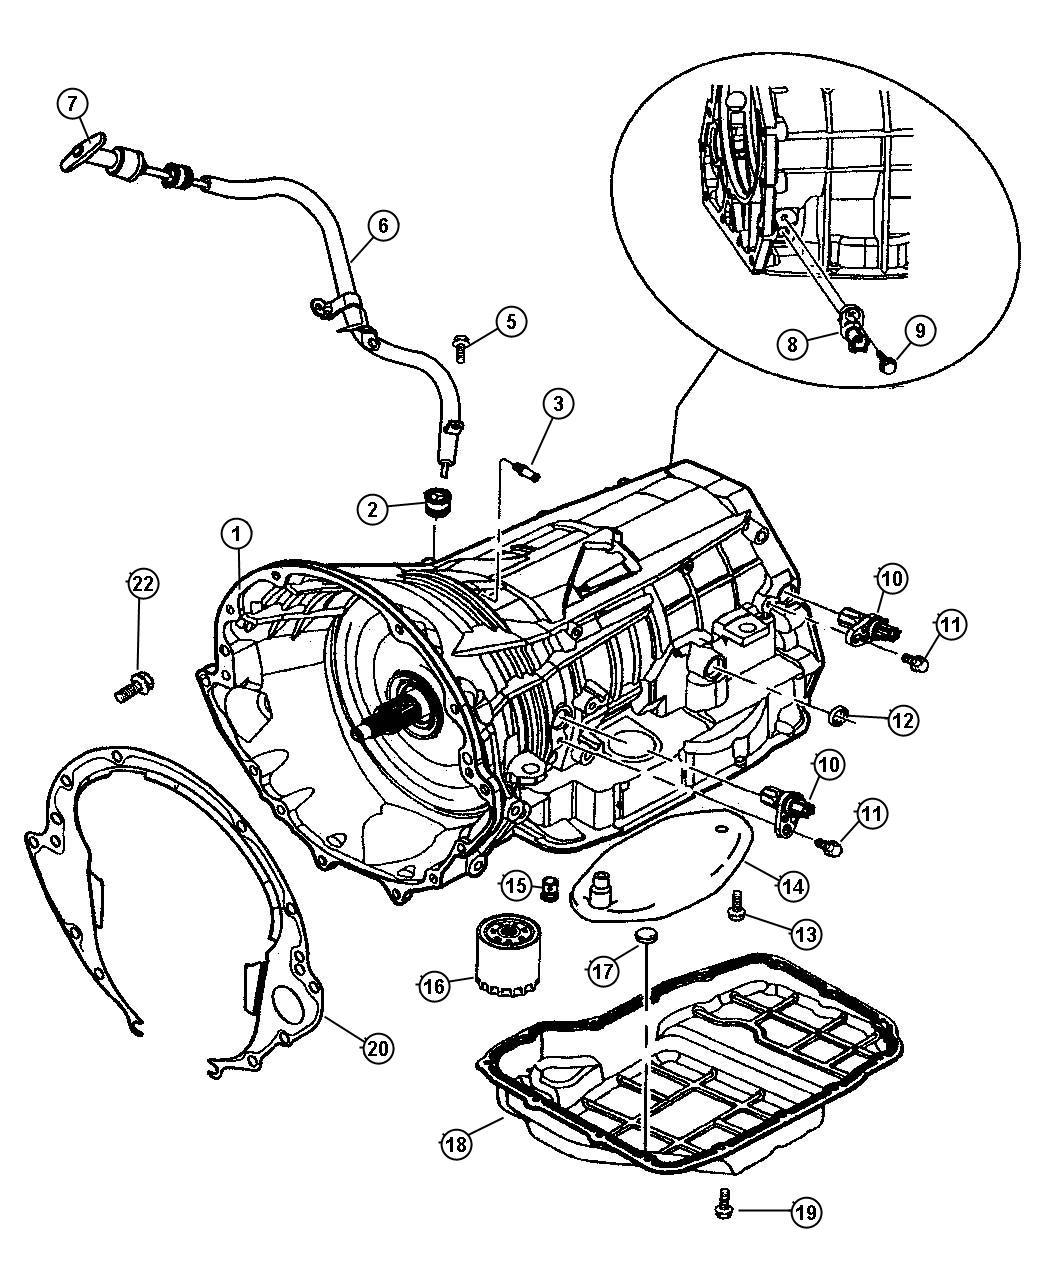 Dodge Viper Indicator Transmission Fluid Level